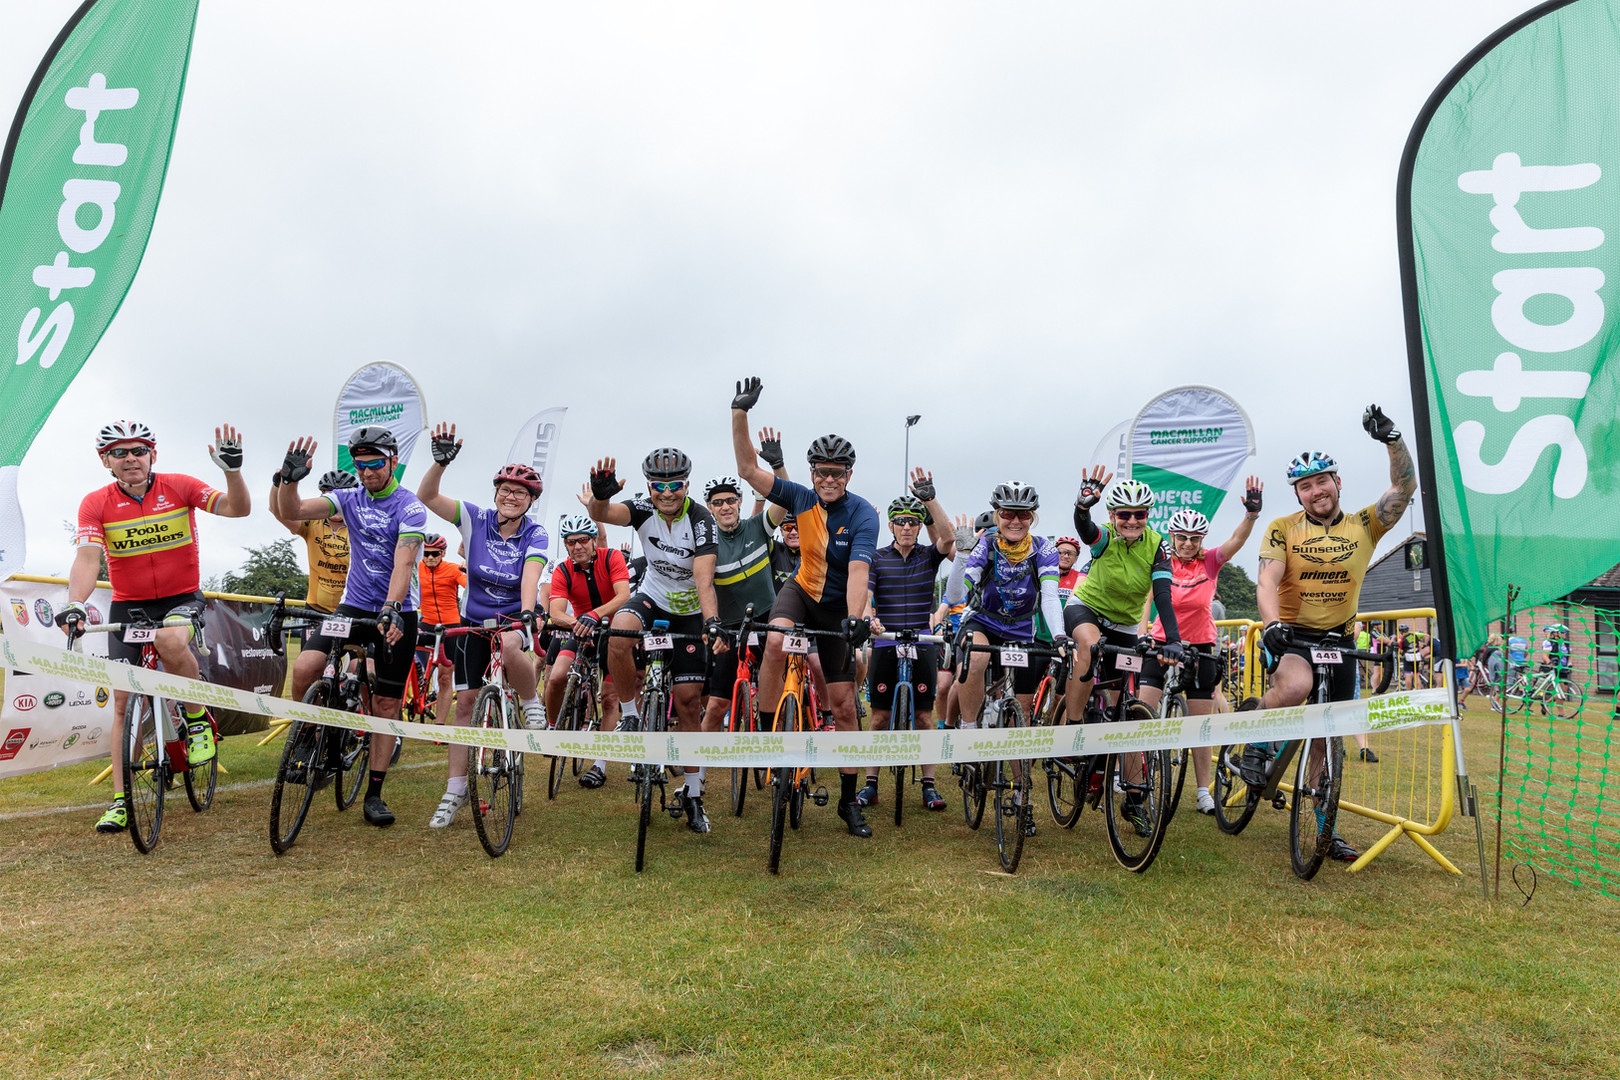 Macmillan Charity Bike Ride